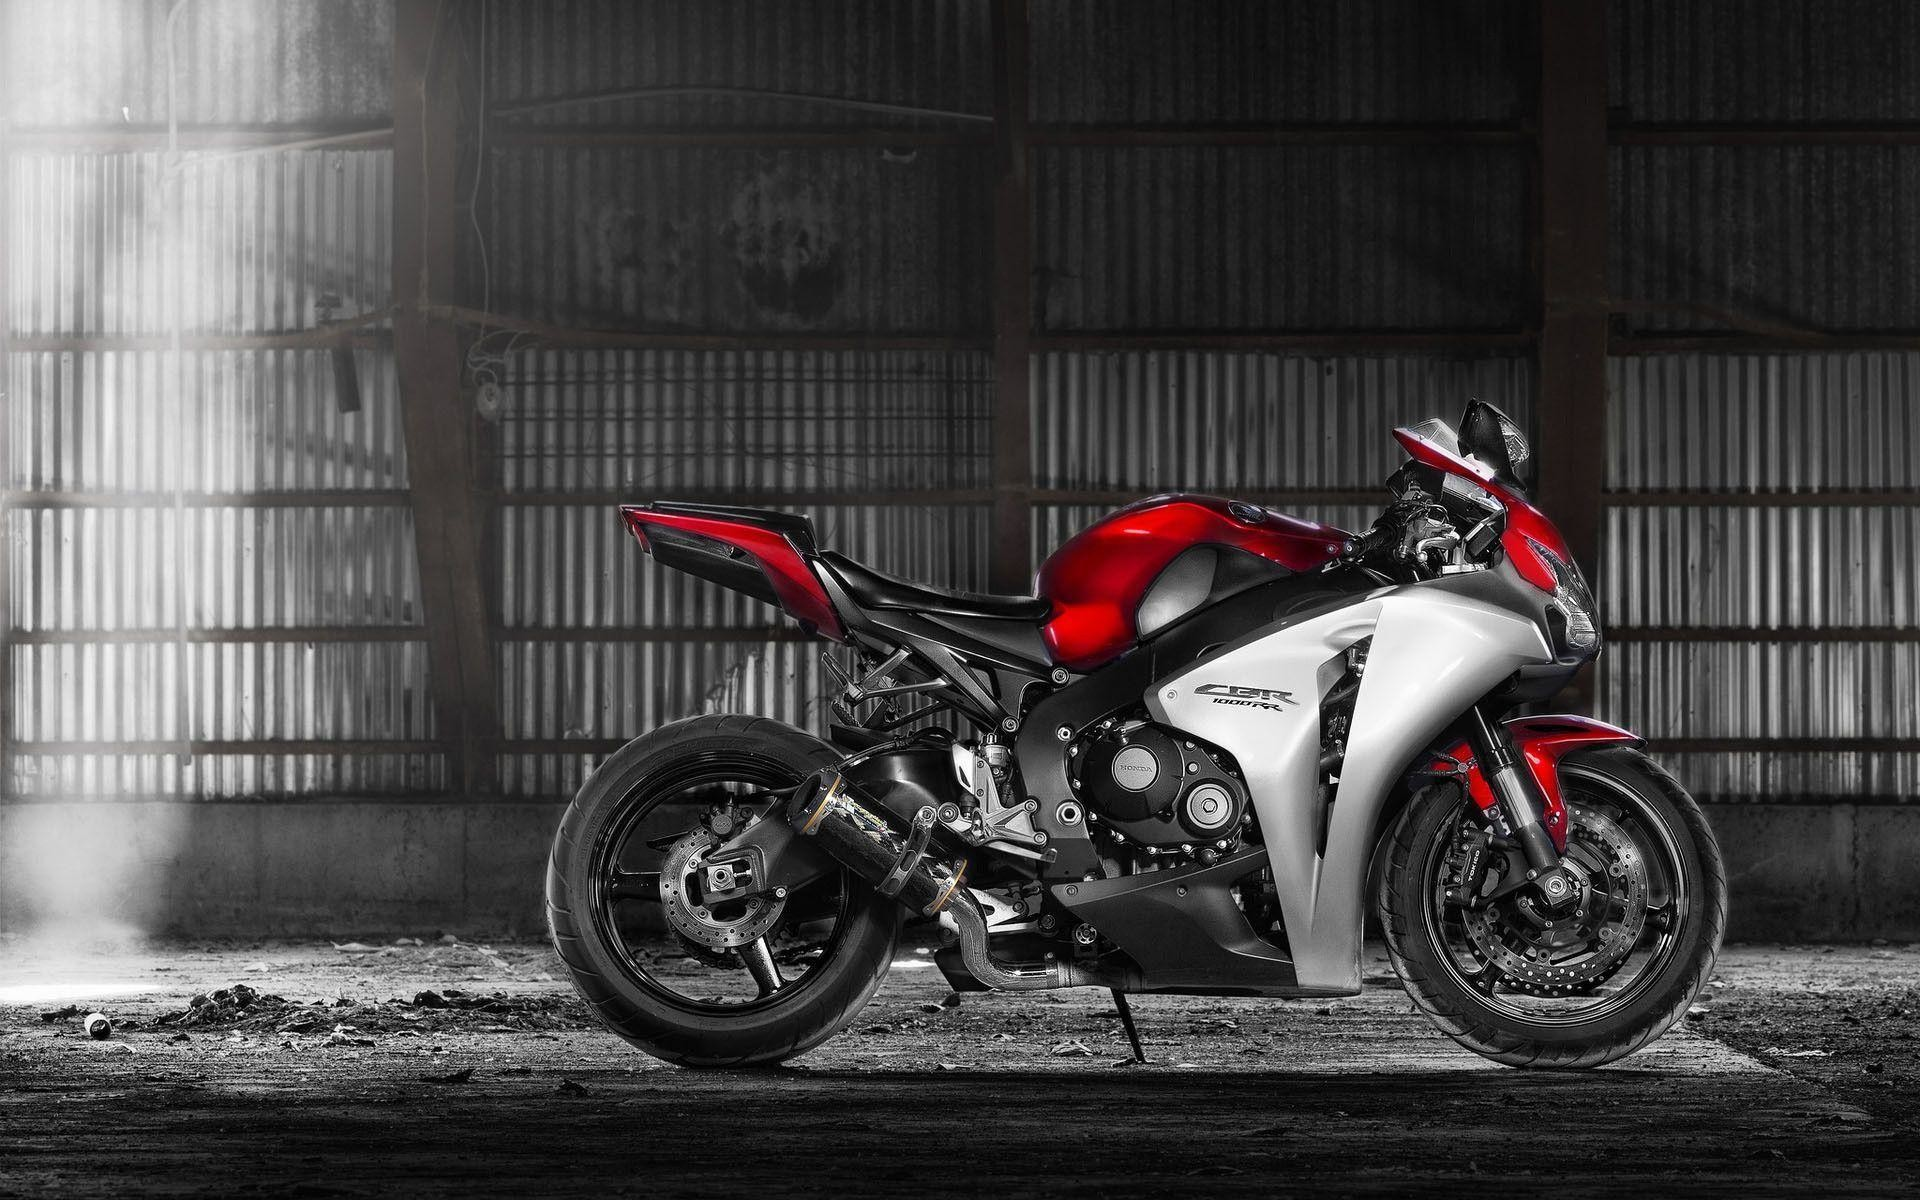 Res: 1920x1200, Honda, Hangar, Light, Honda Cbr1000rr, Motorcycle | Free HD wallpapers